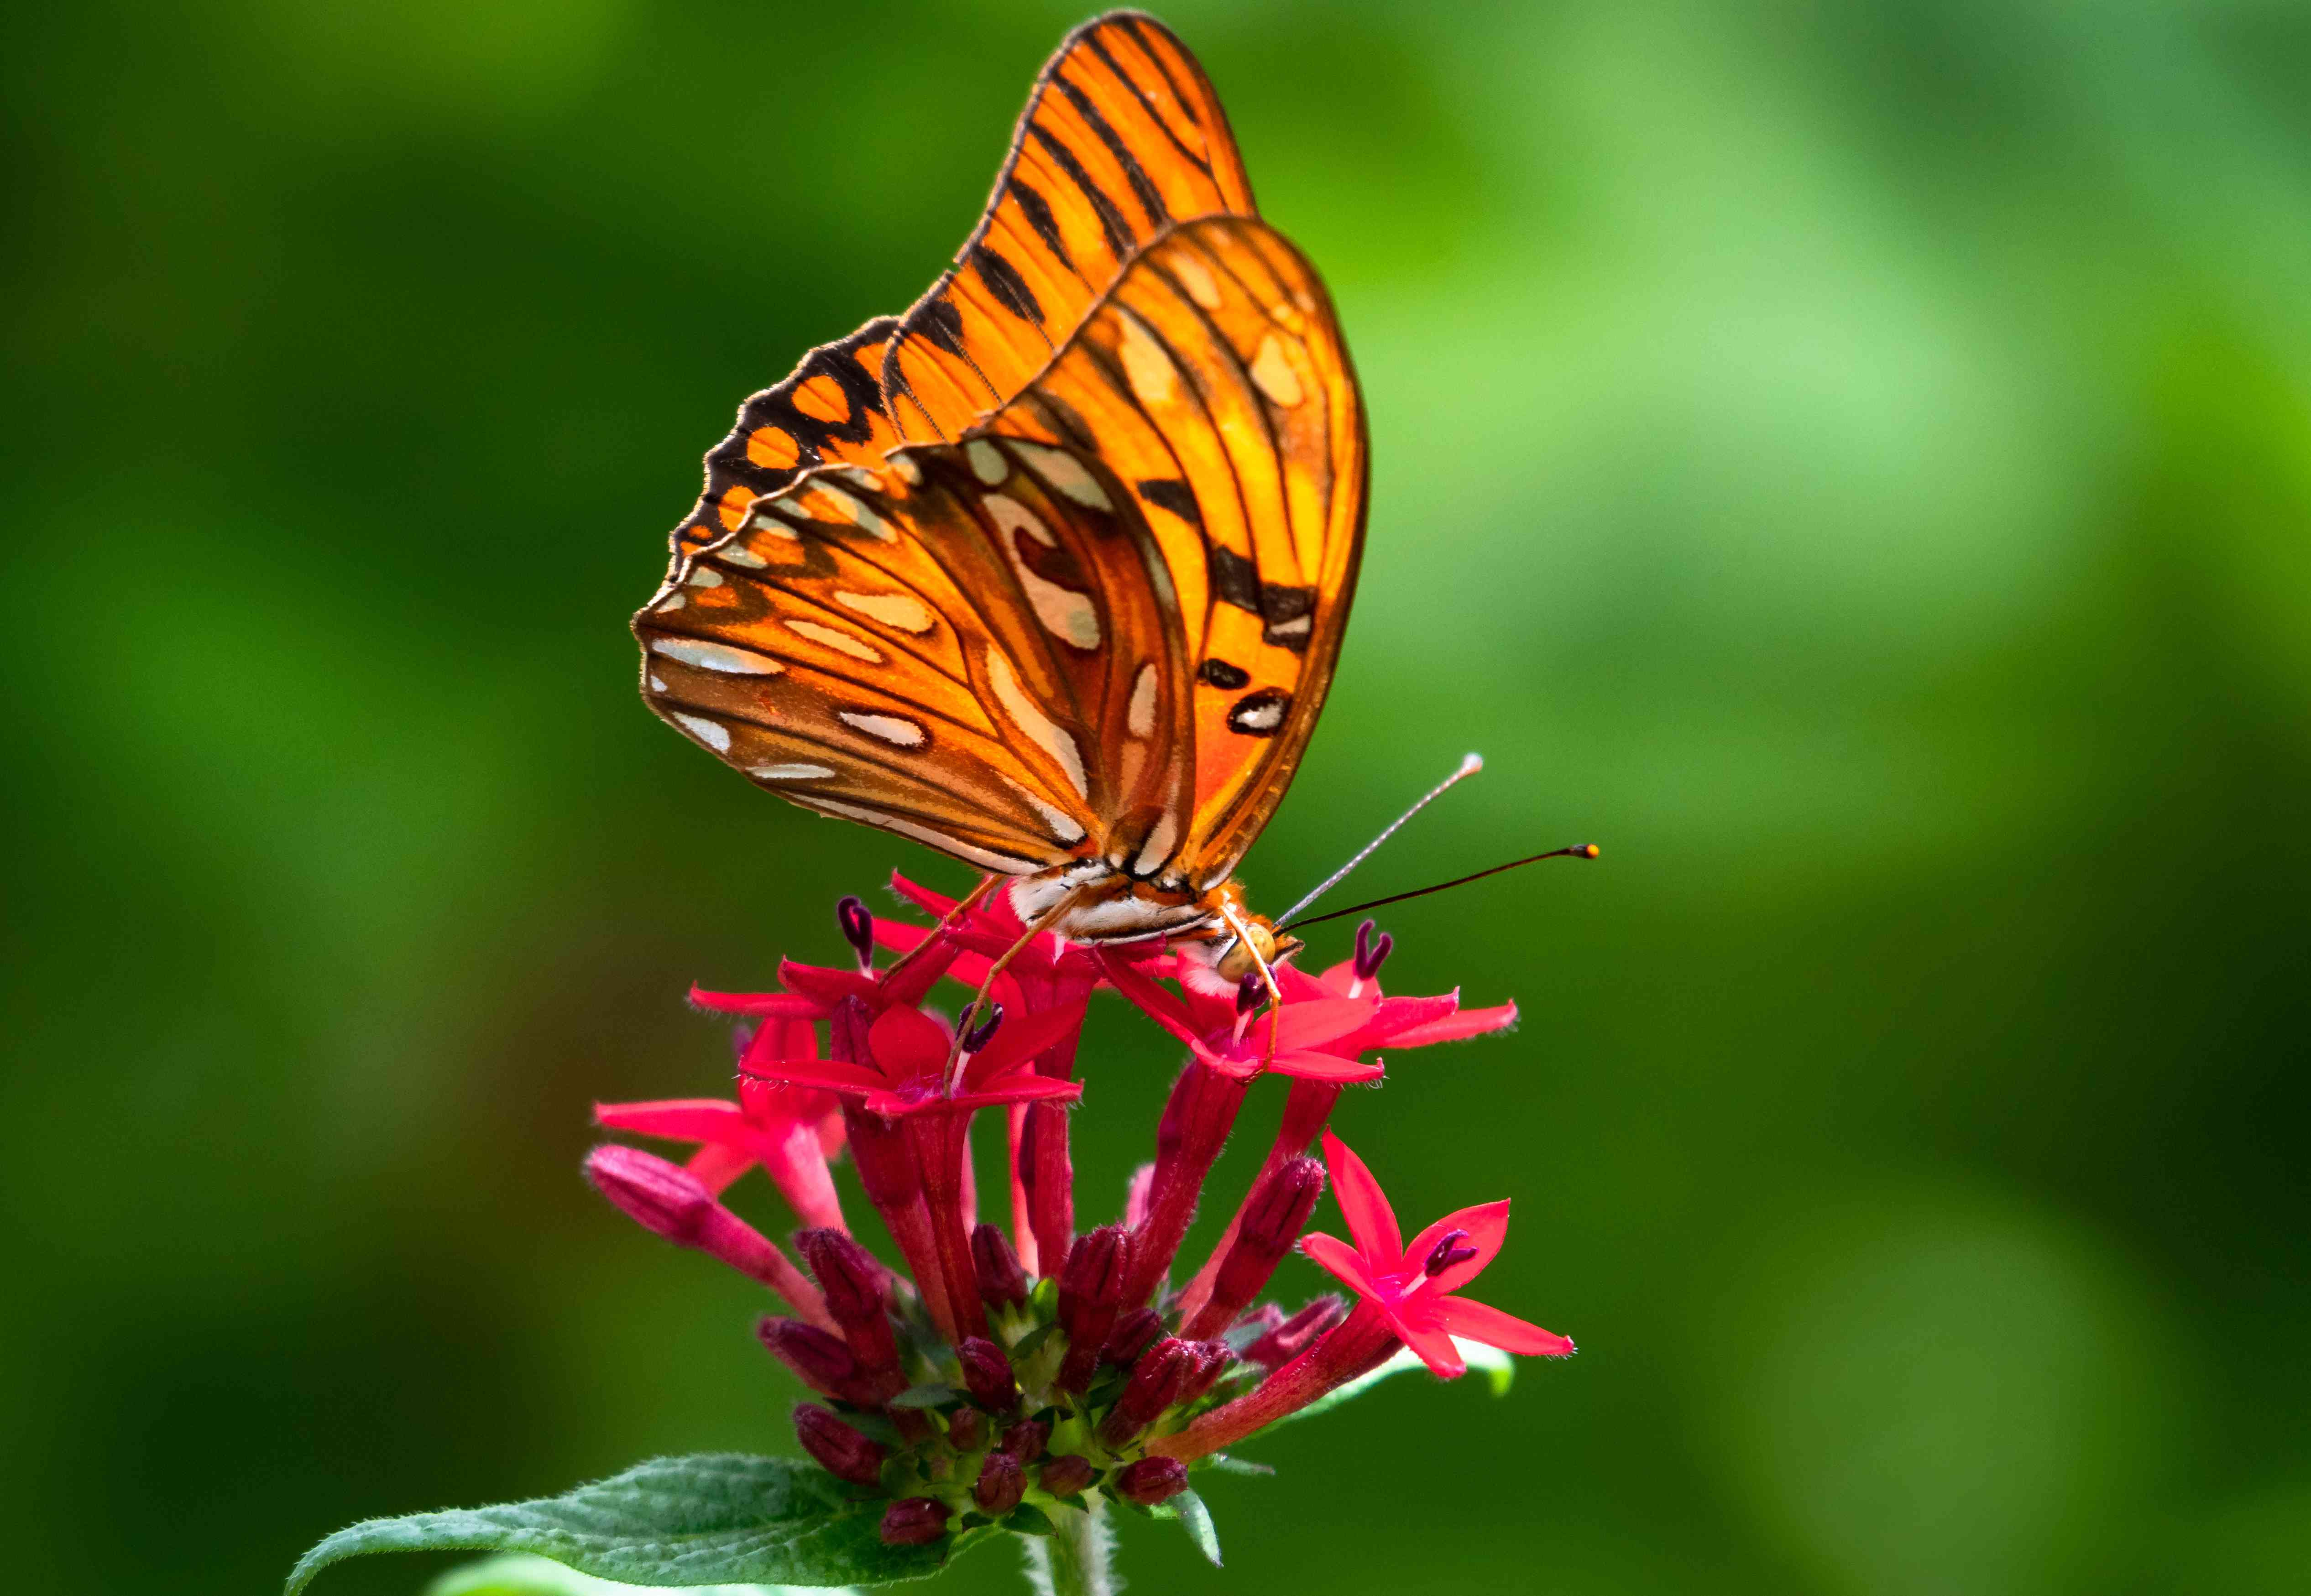 A Gulf Fritillary Butterfly on a Penta flower